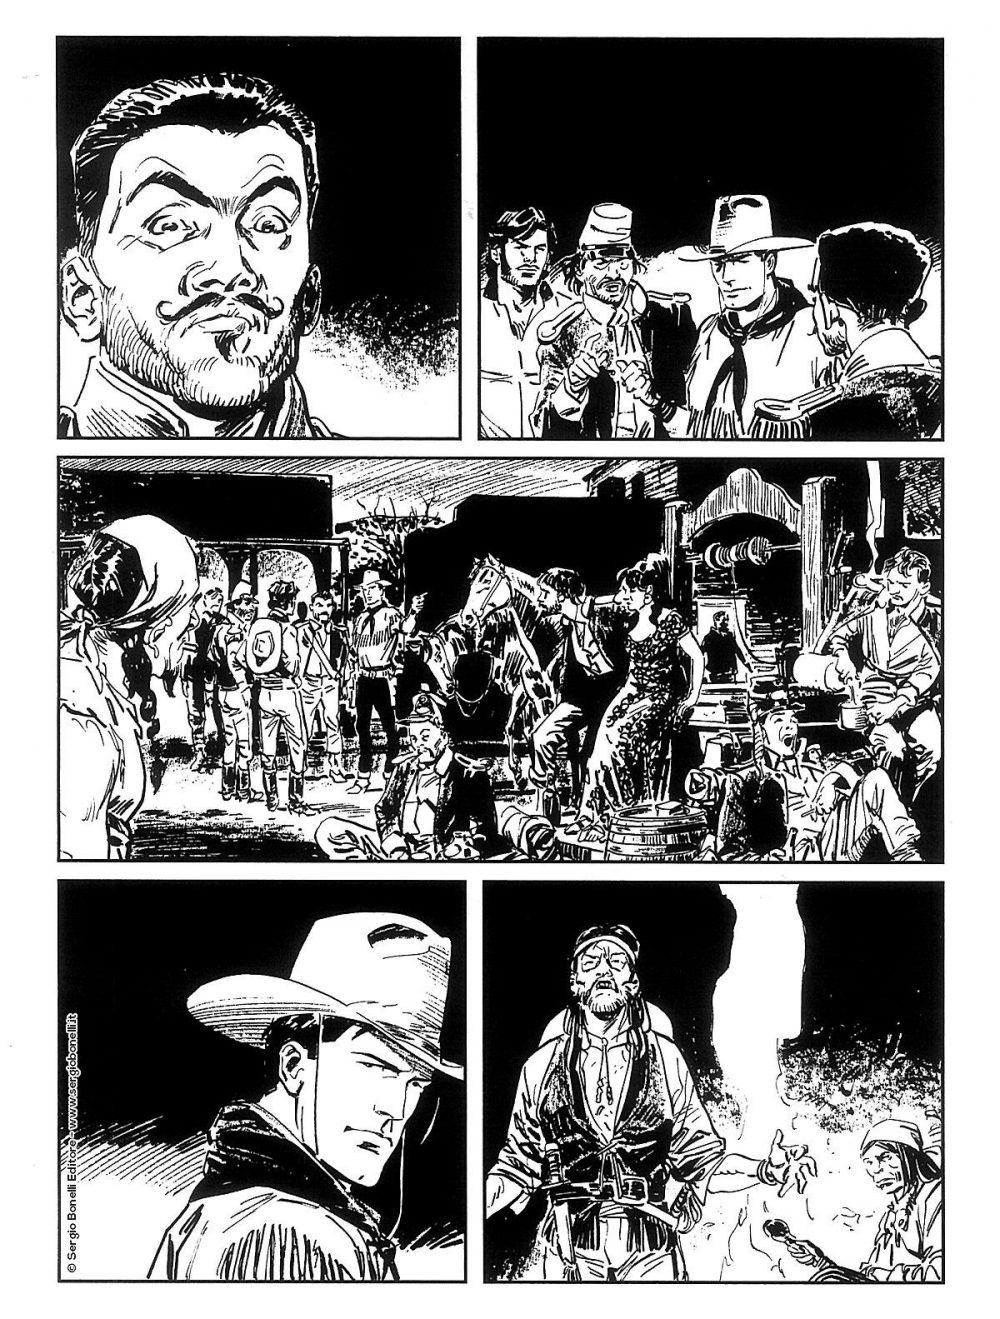 Tex Willer 8: La prigioniera, anteprima 03